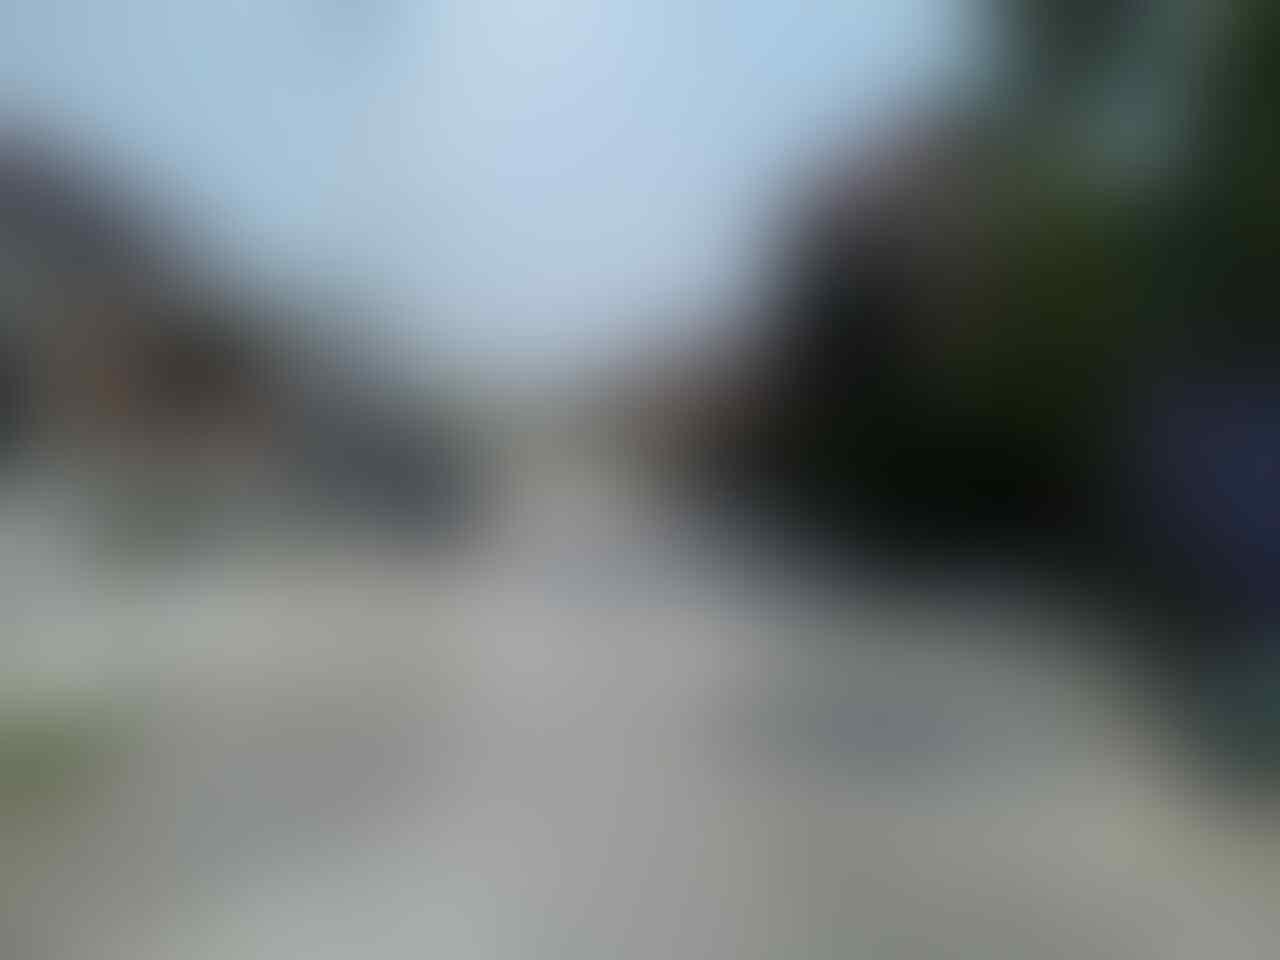 Jual Rumah 45/105 Murah Kemiri Buduran Sidoarjo 500m dari Fly Over Buduran!